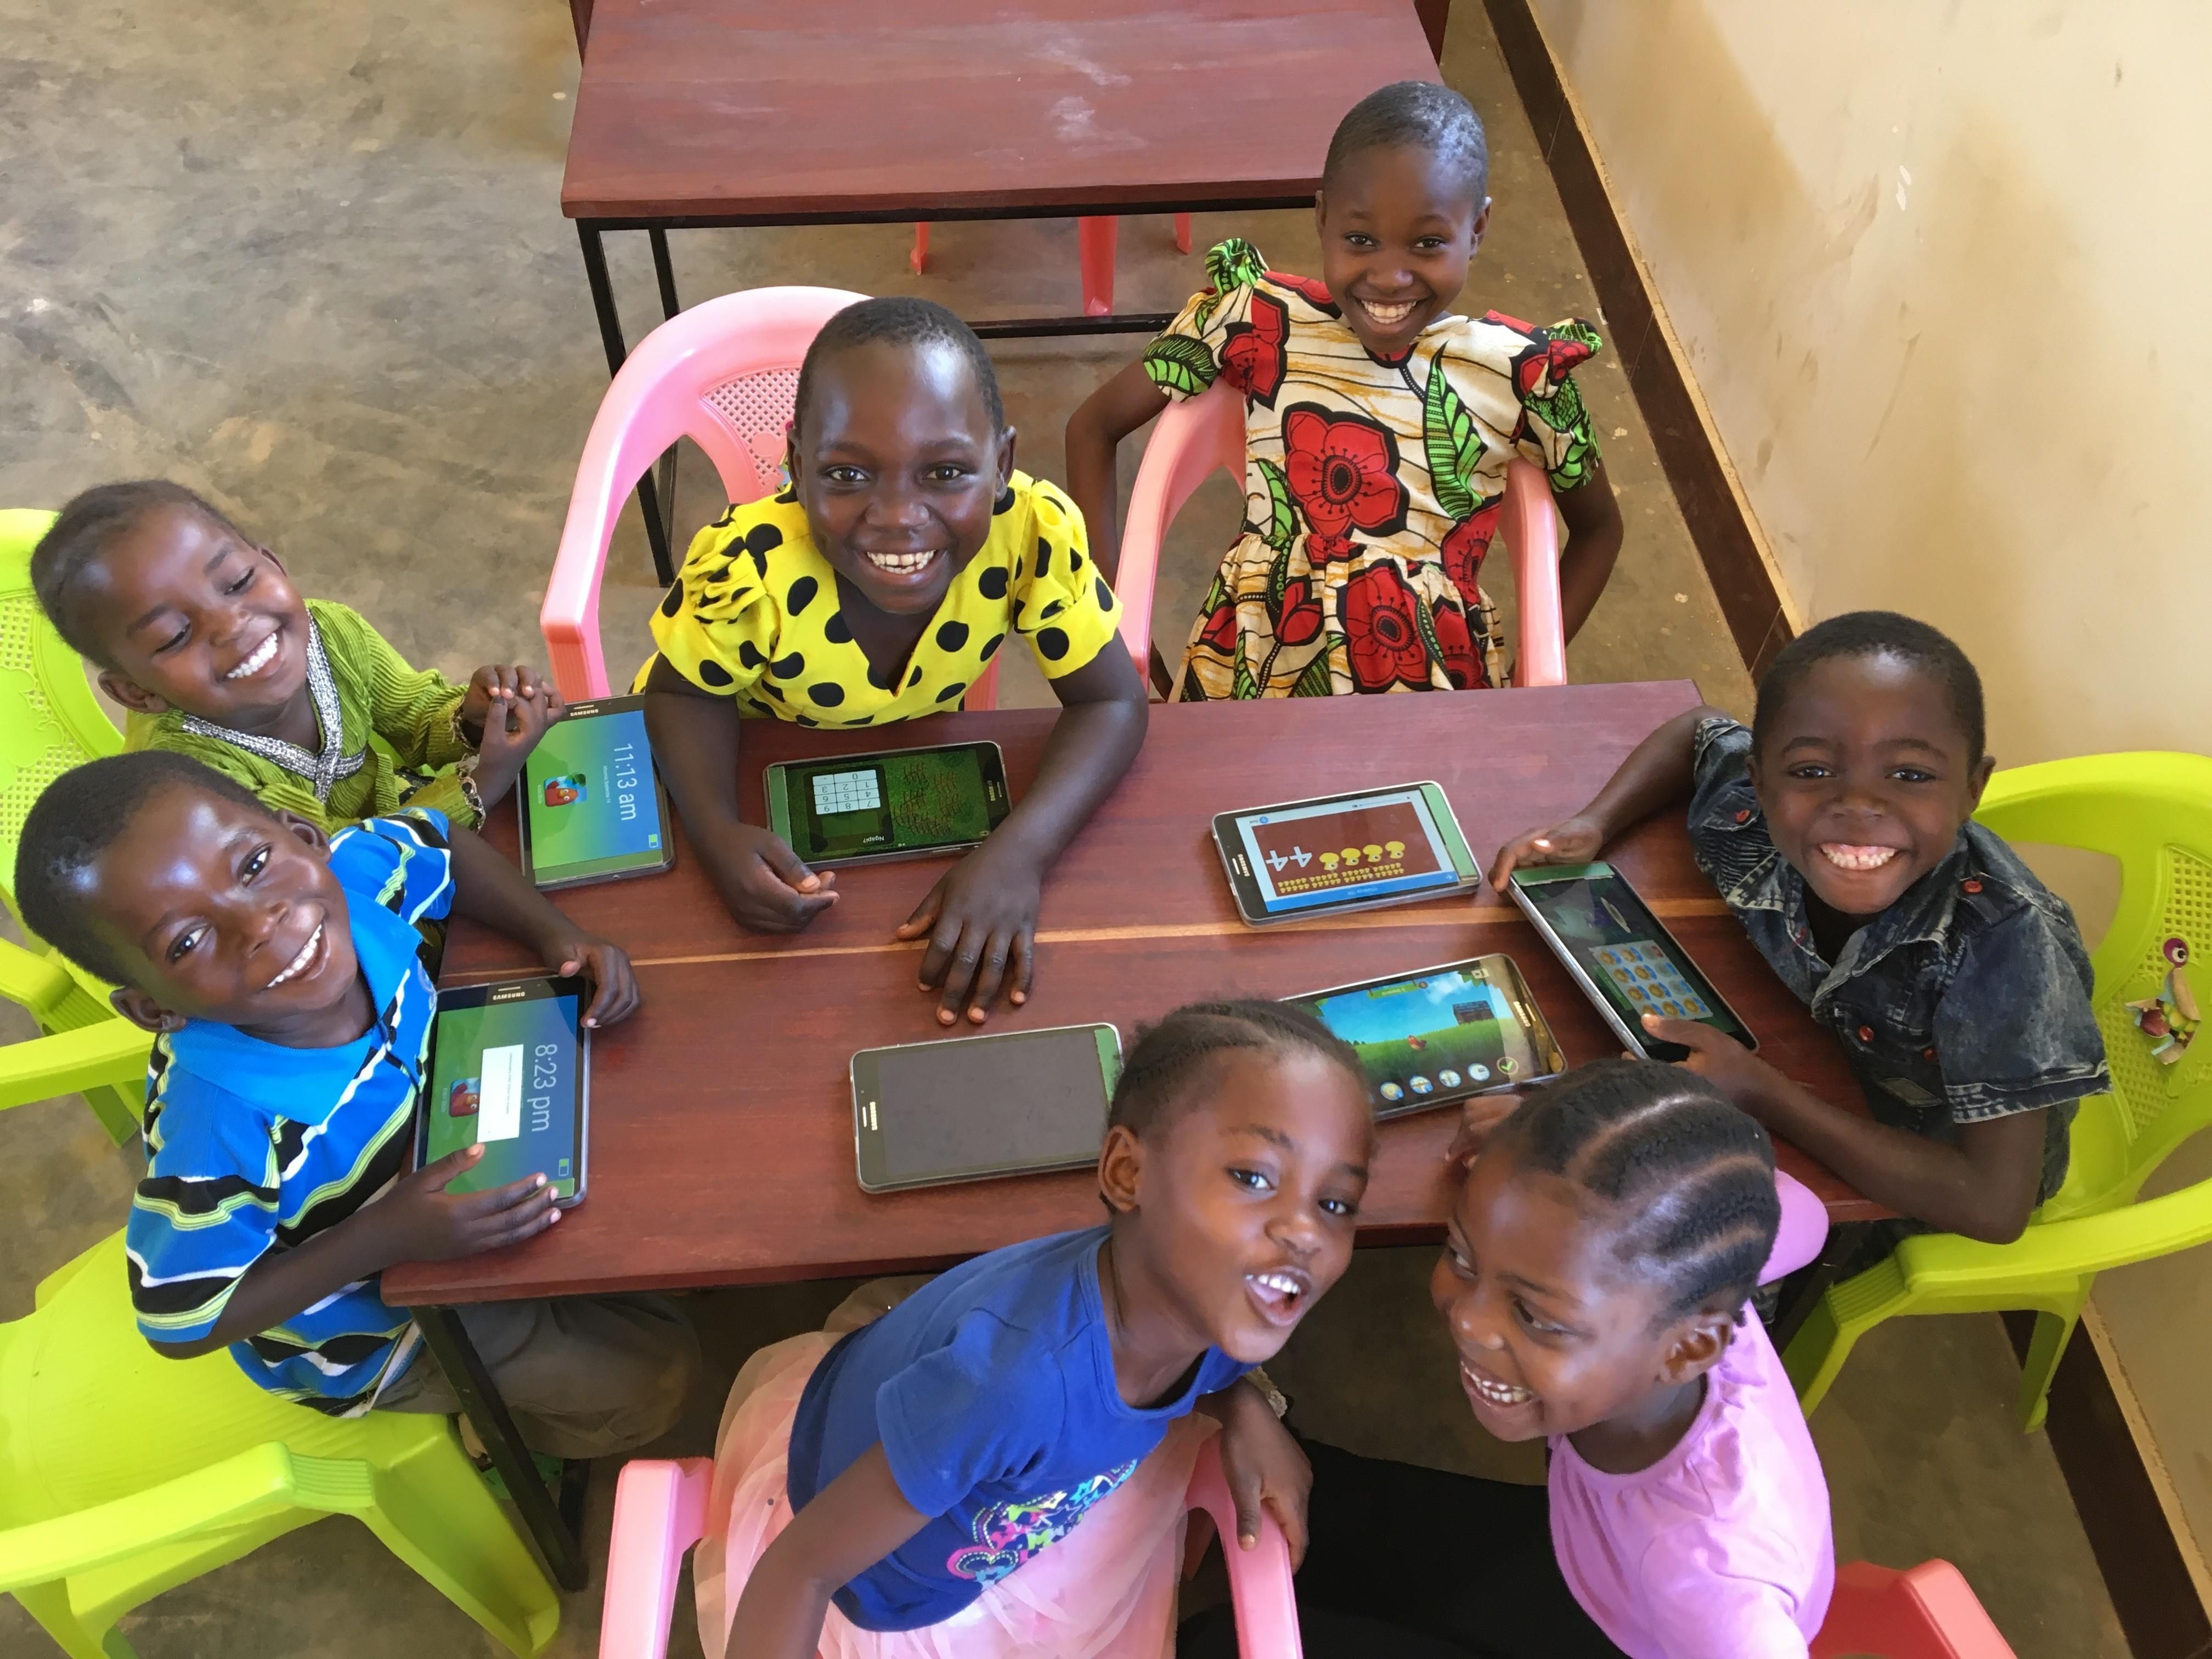 Schwab Foundation social innovators entrepreneurs children with technology tablets smartphones STEM education